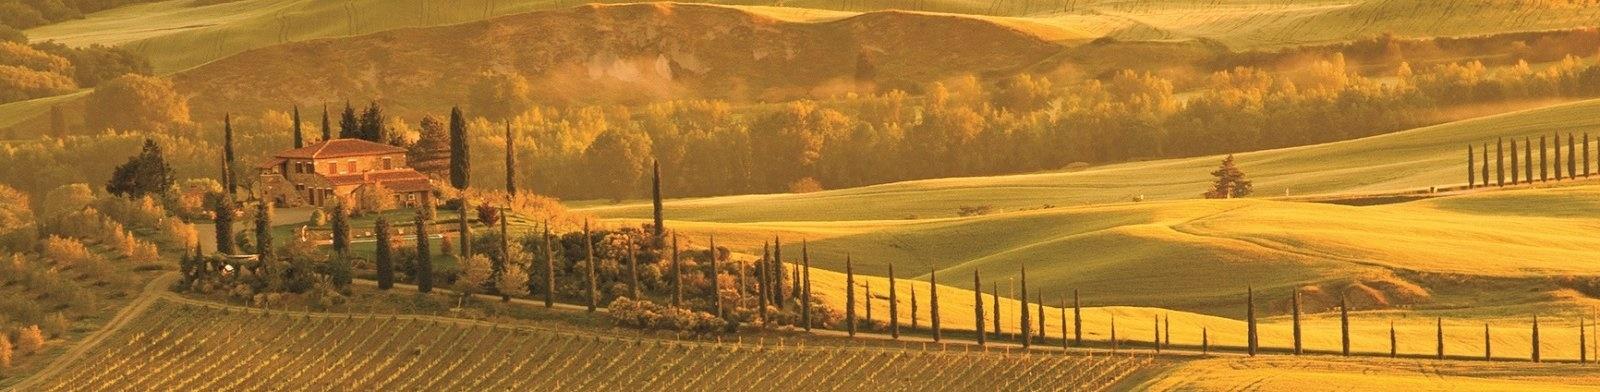 Tuscan Hills, Italy